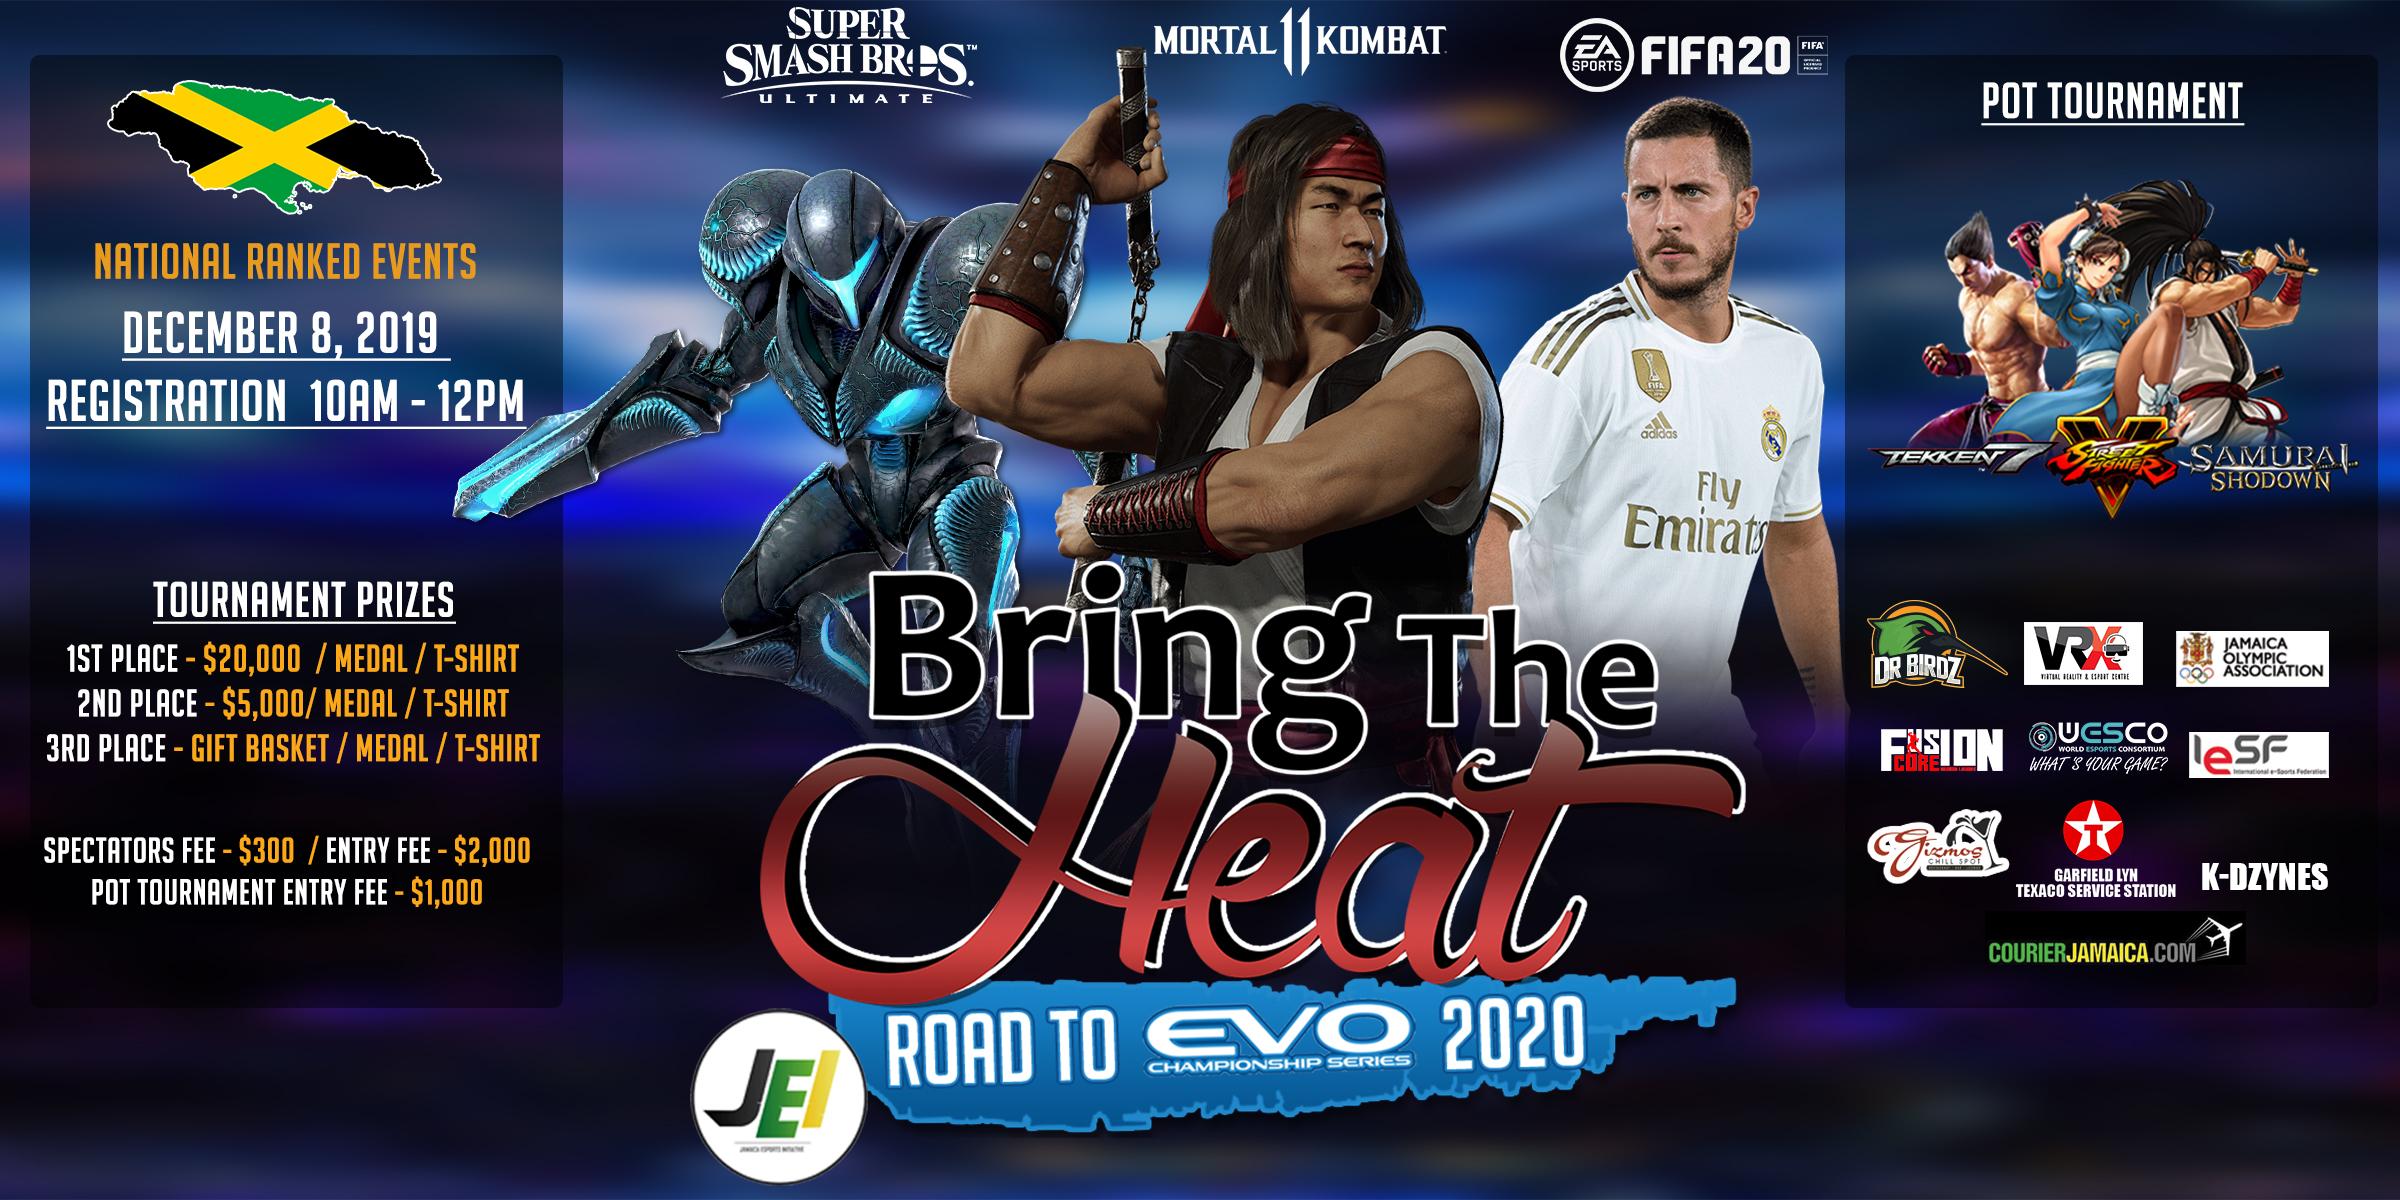 Evo 2020 Games.Bring The Heat Details